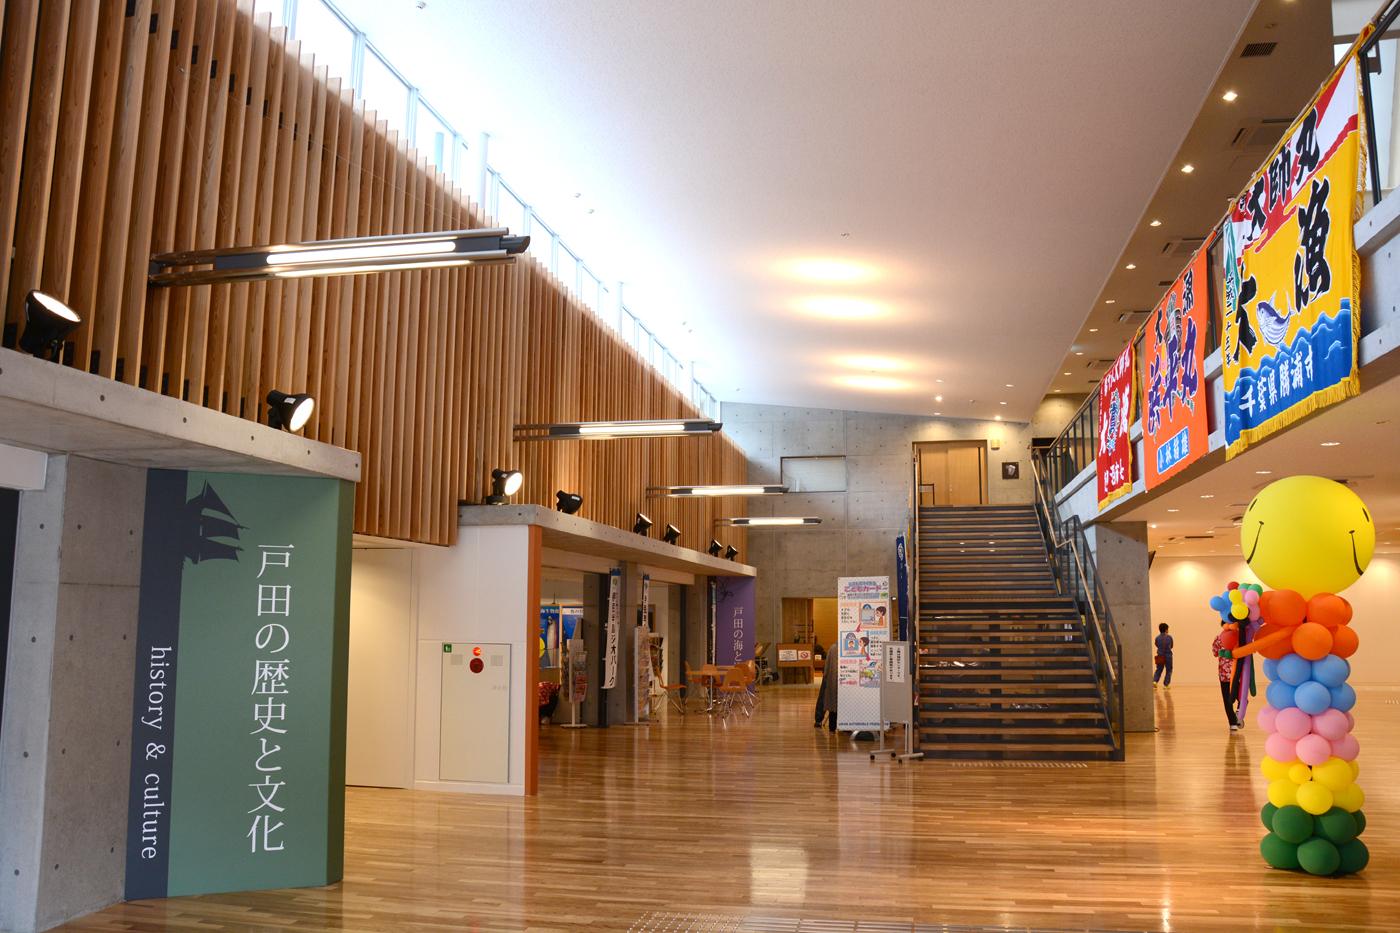 Numazu Visitor Center